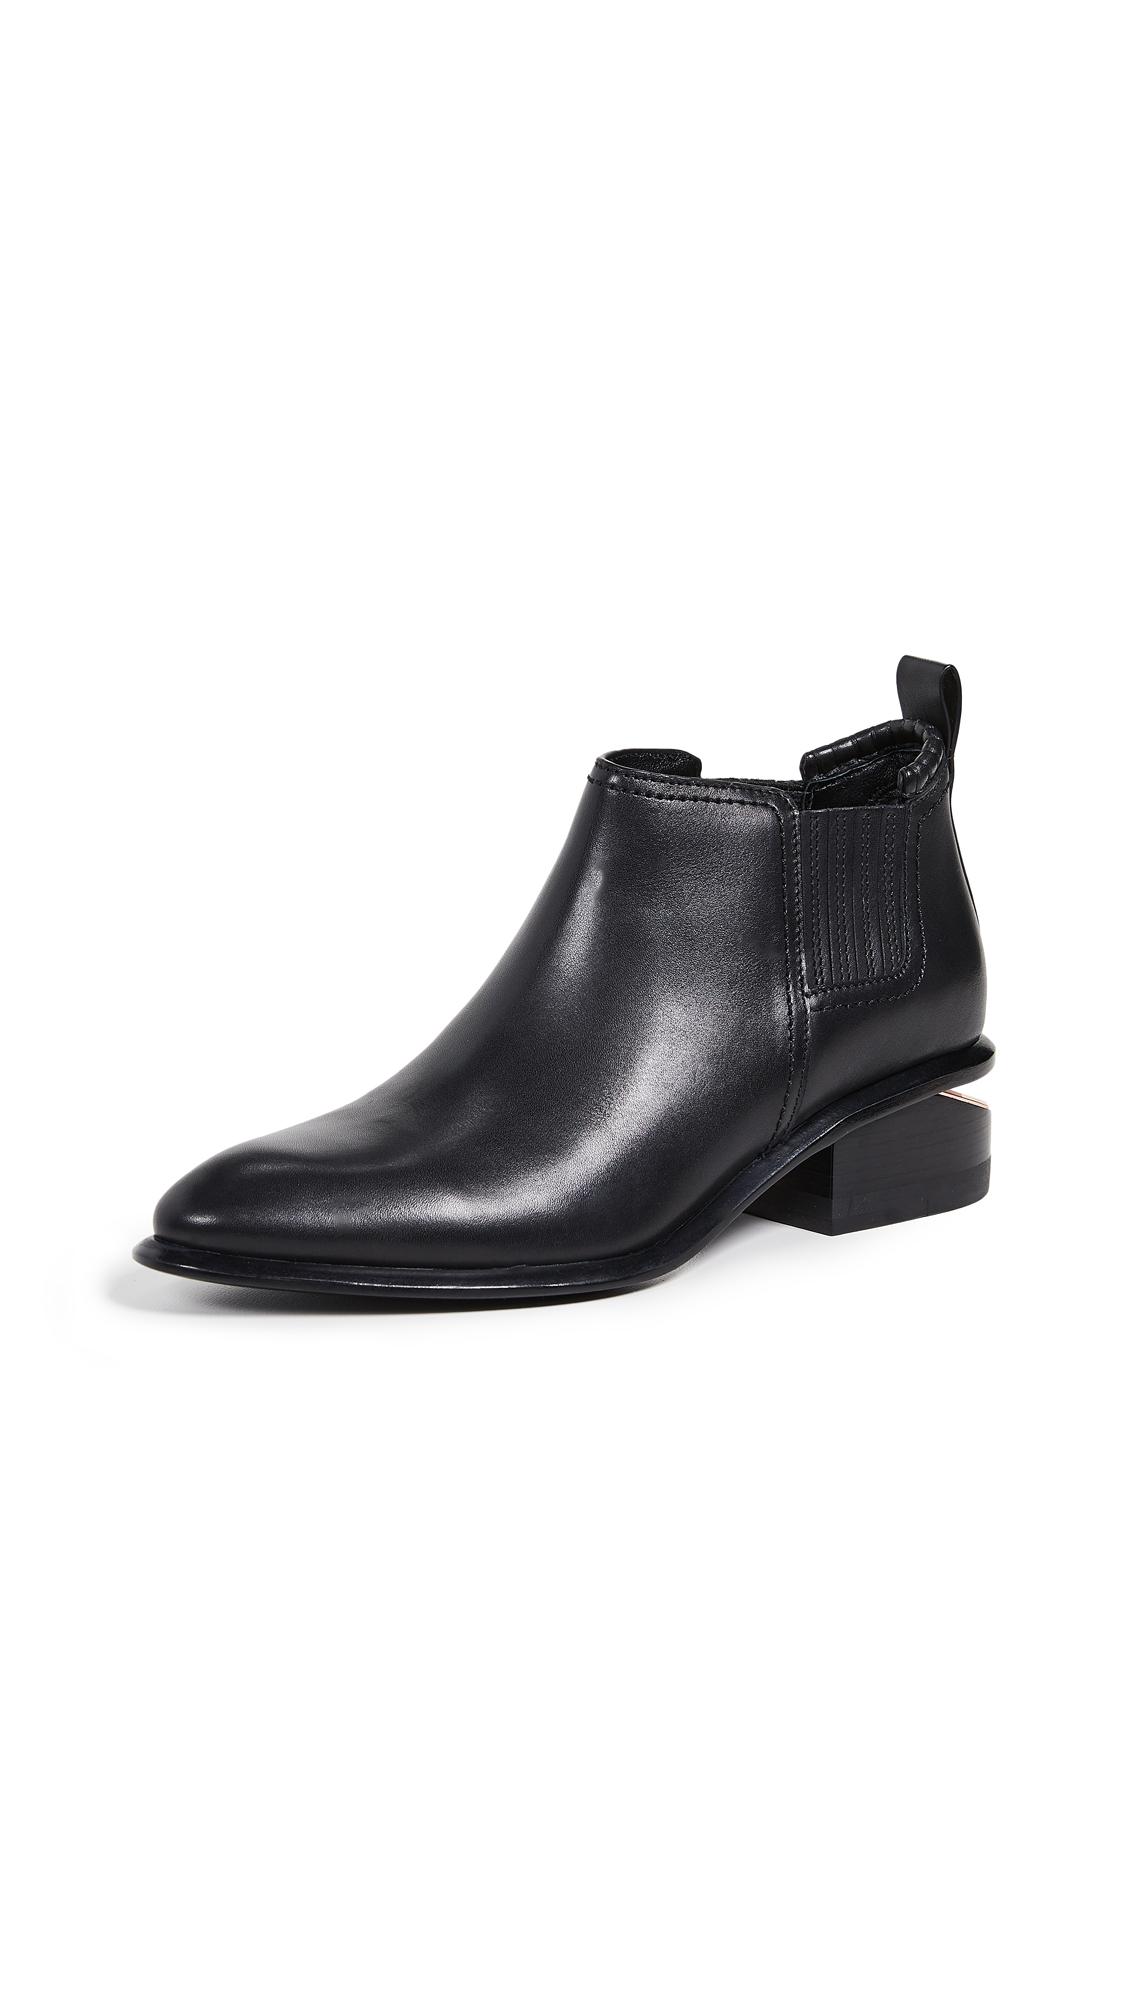 Kori Ankle Booties in Black/Rose Gold